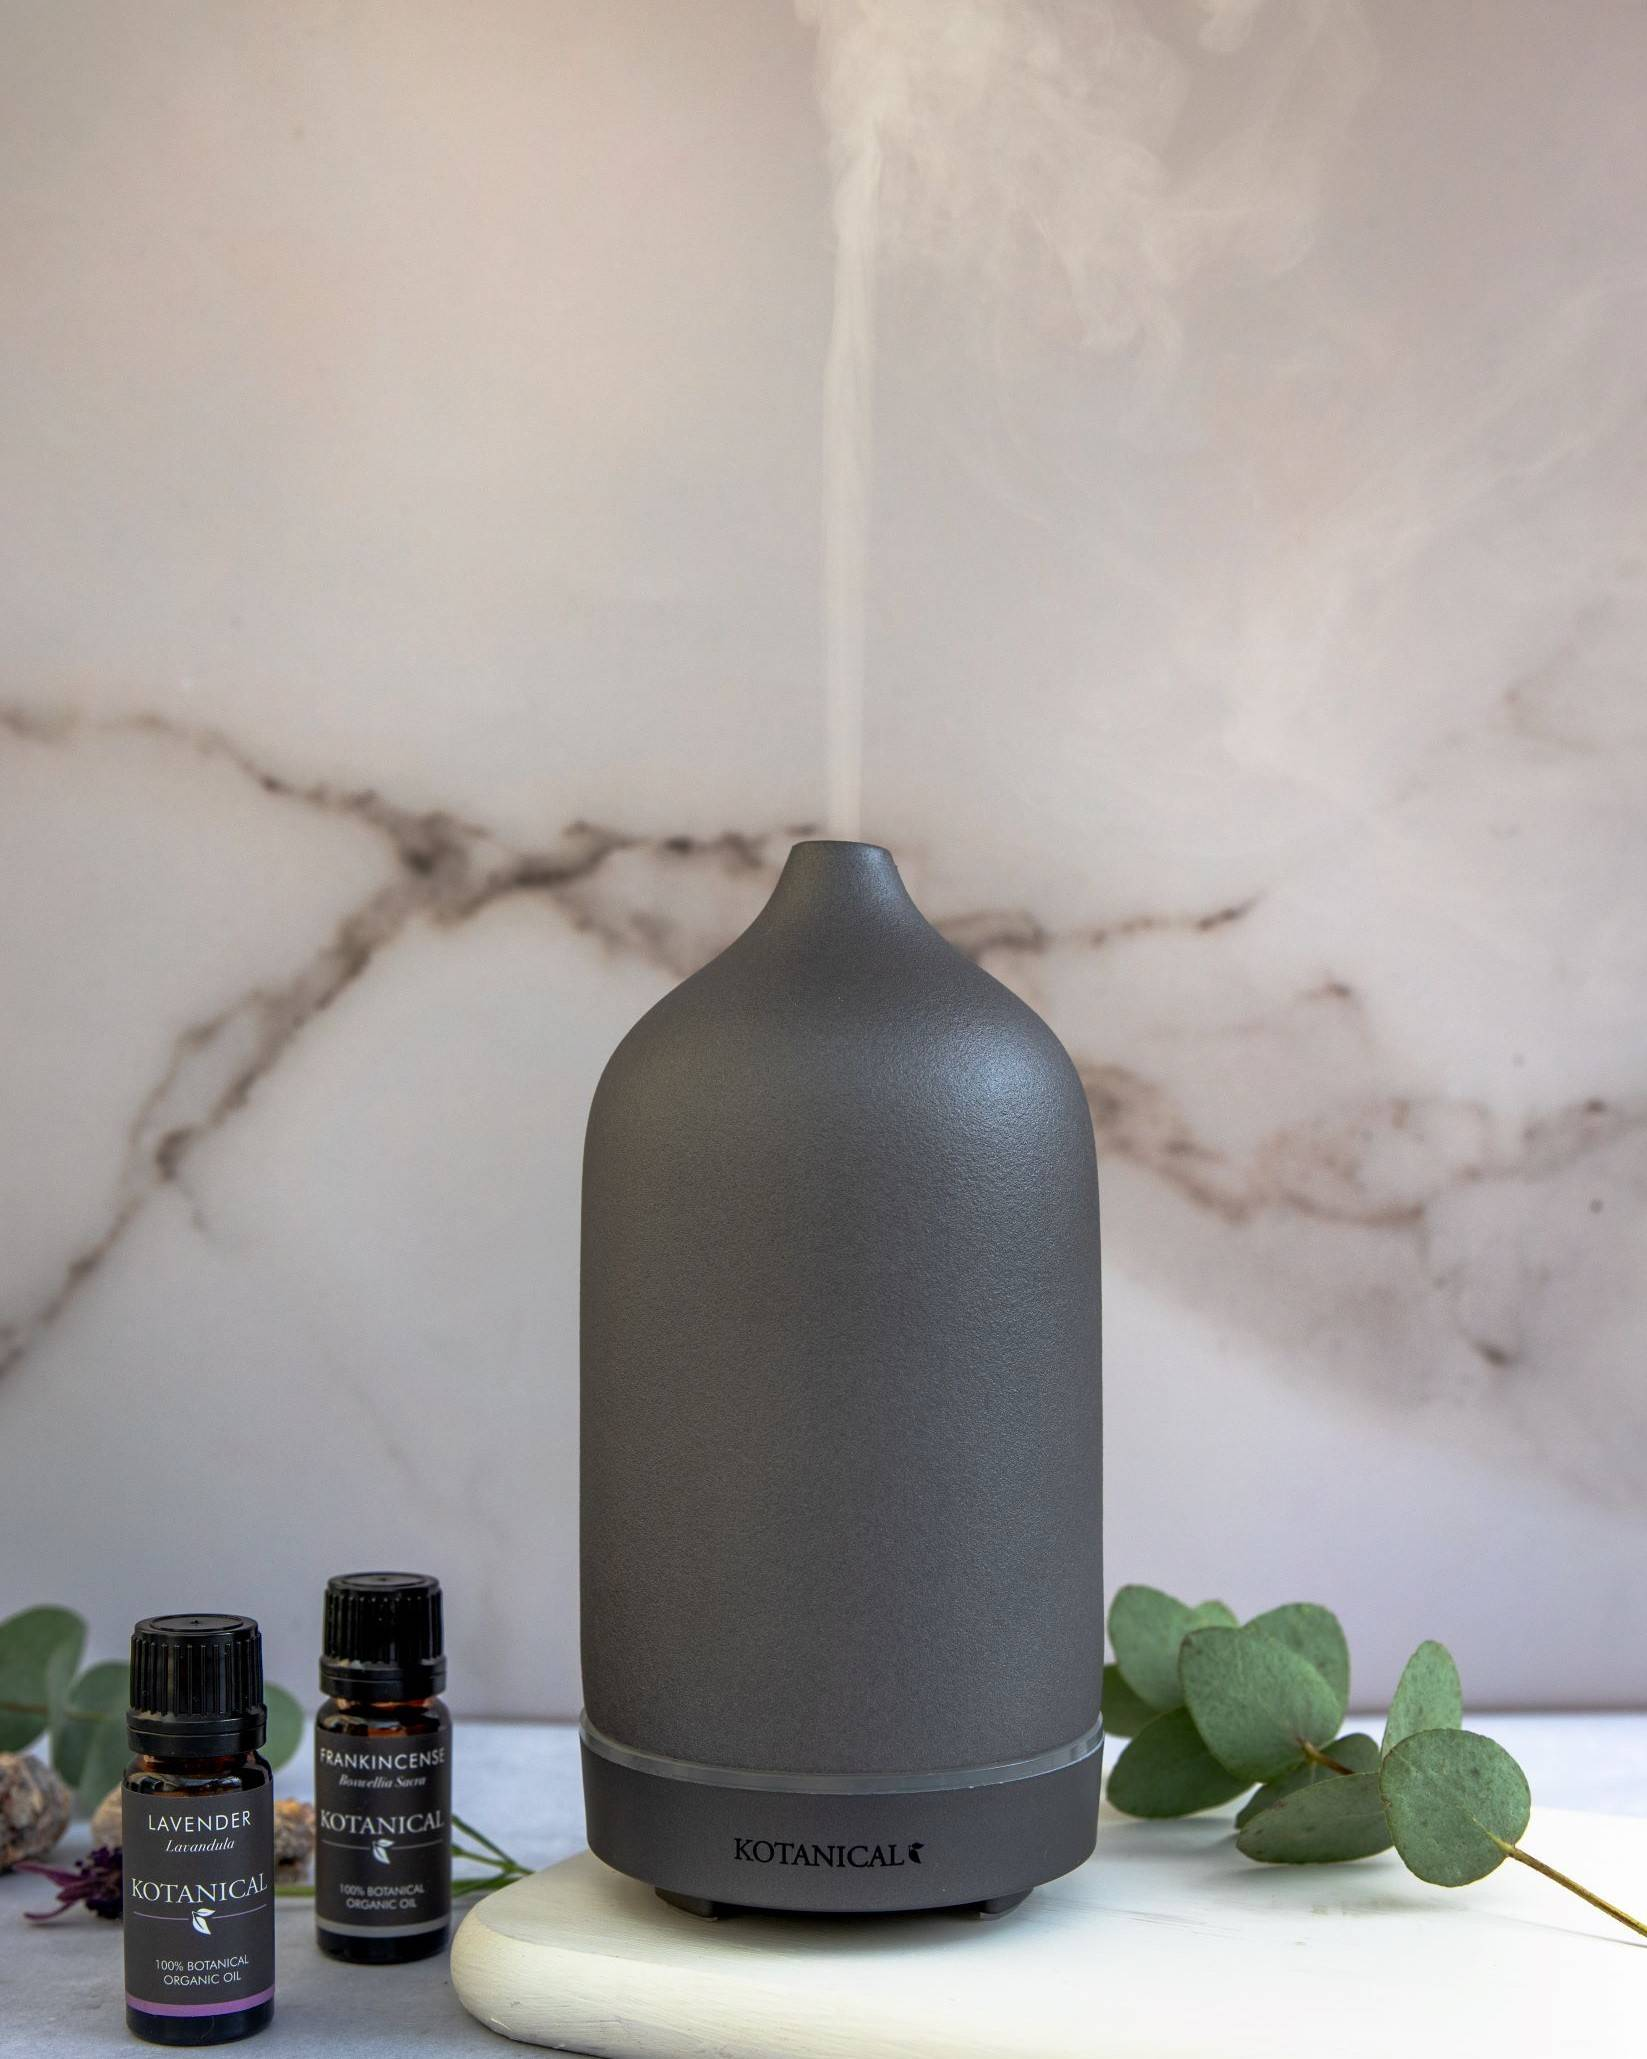 Kotanical Essential oils & Diffusers – kotanical